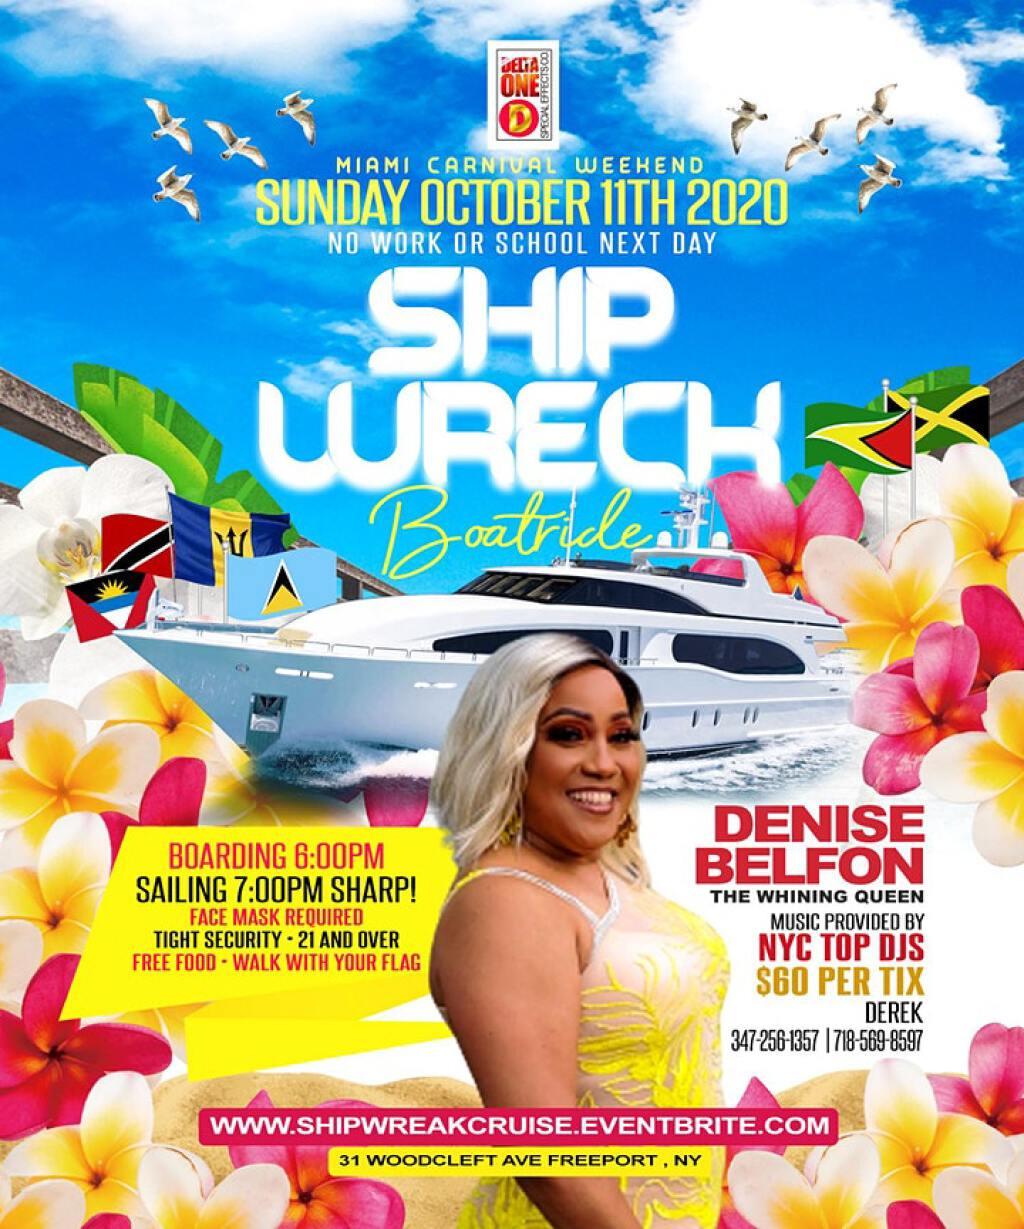 Ship Wreck Boatride flyer or graphic.